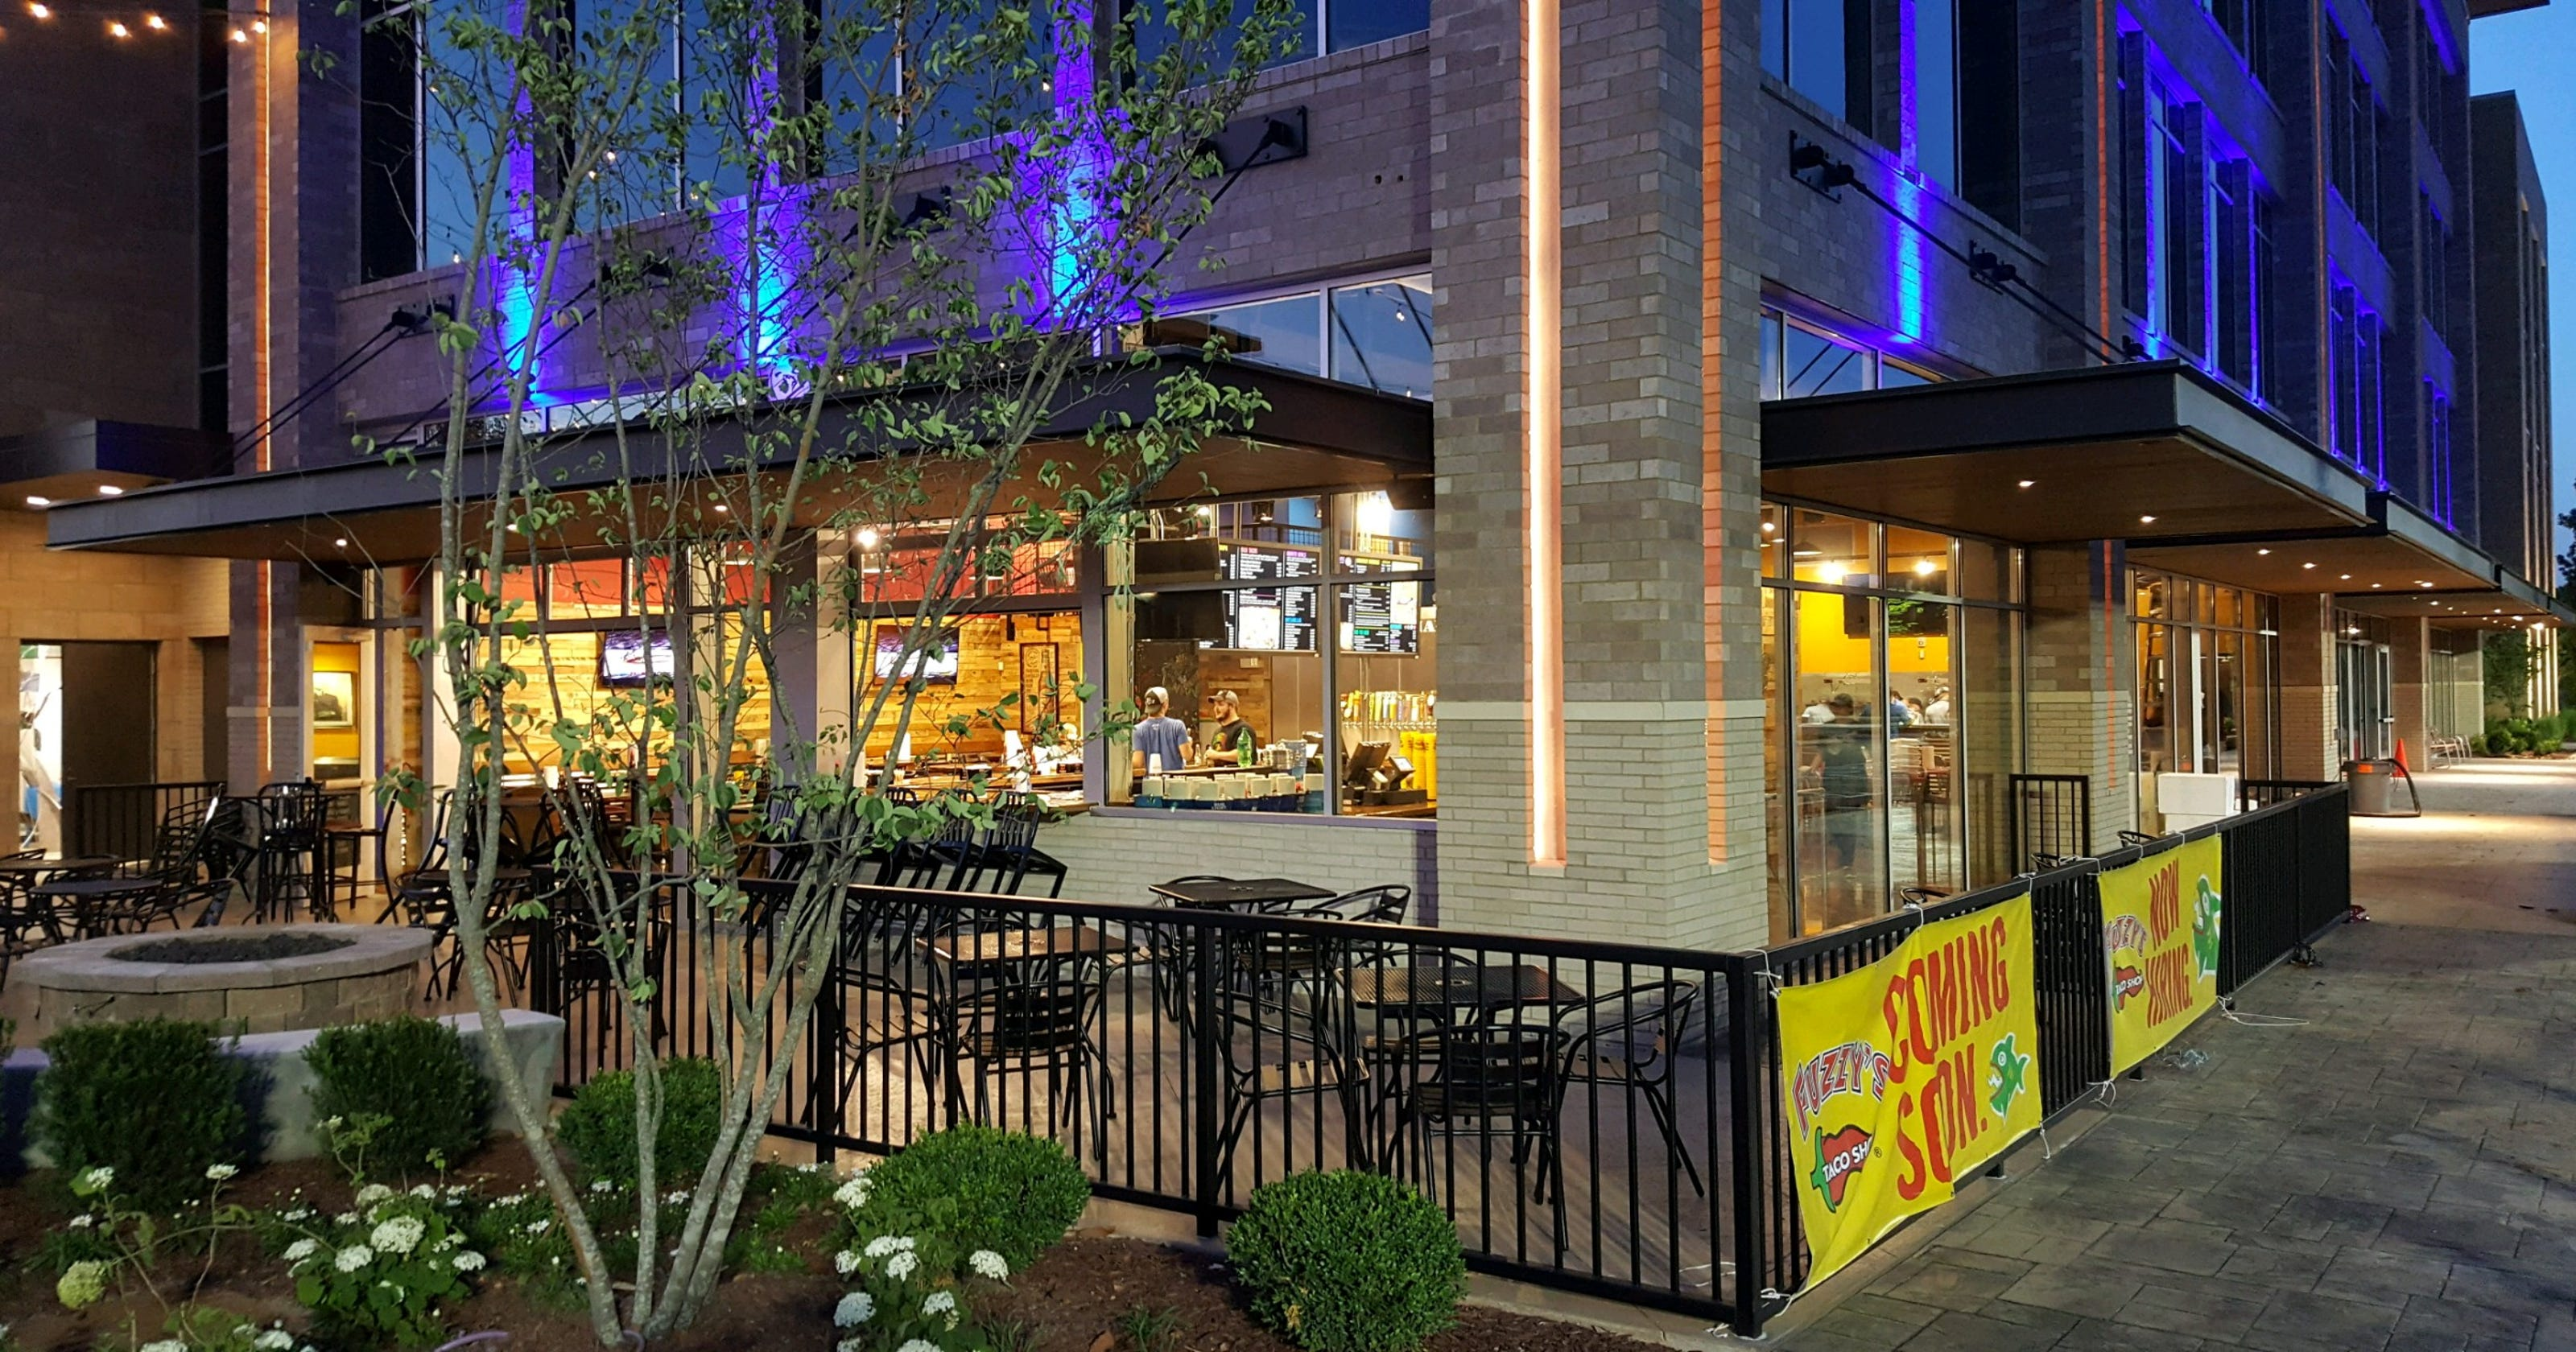 Restaurants With Outdoor Seating In Murfreesboro Tn